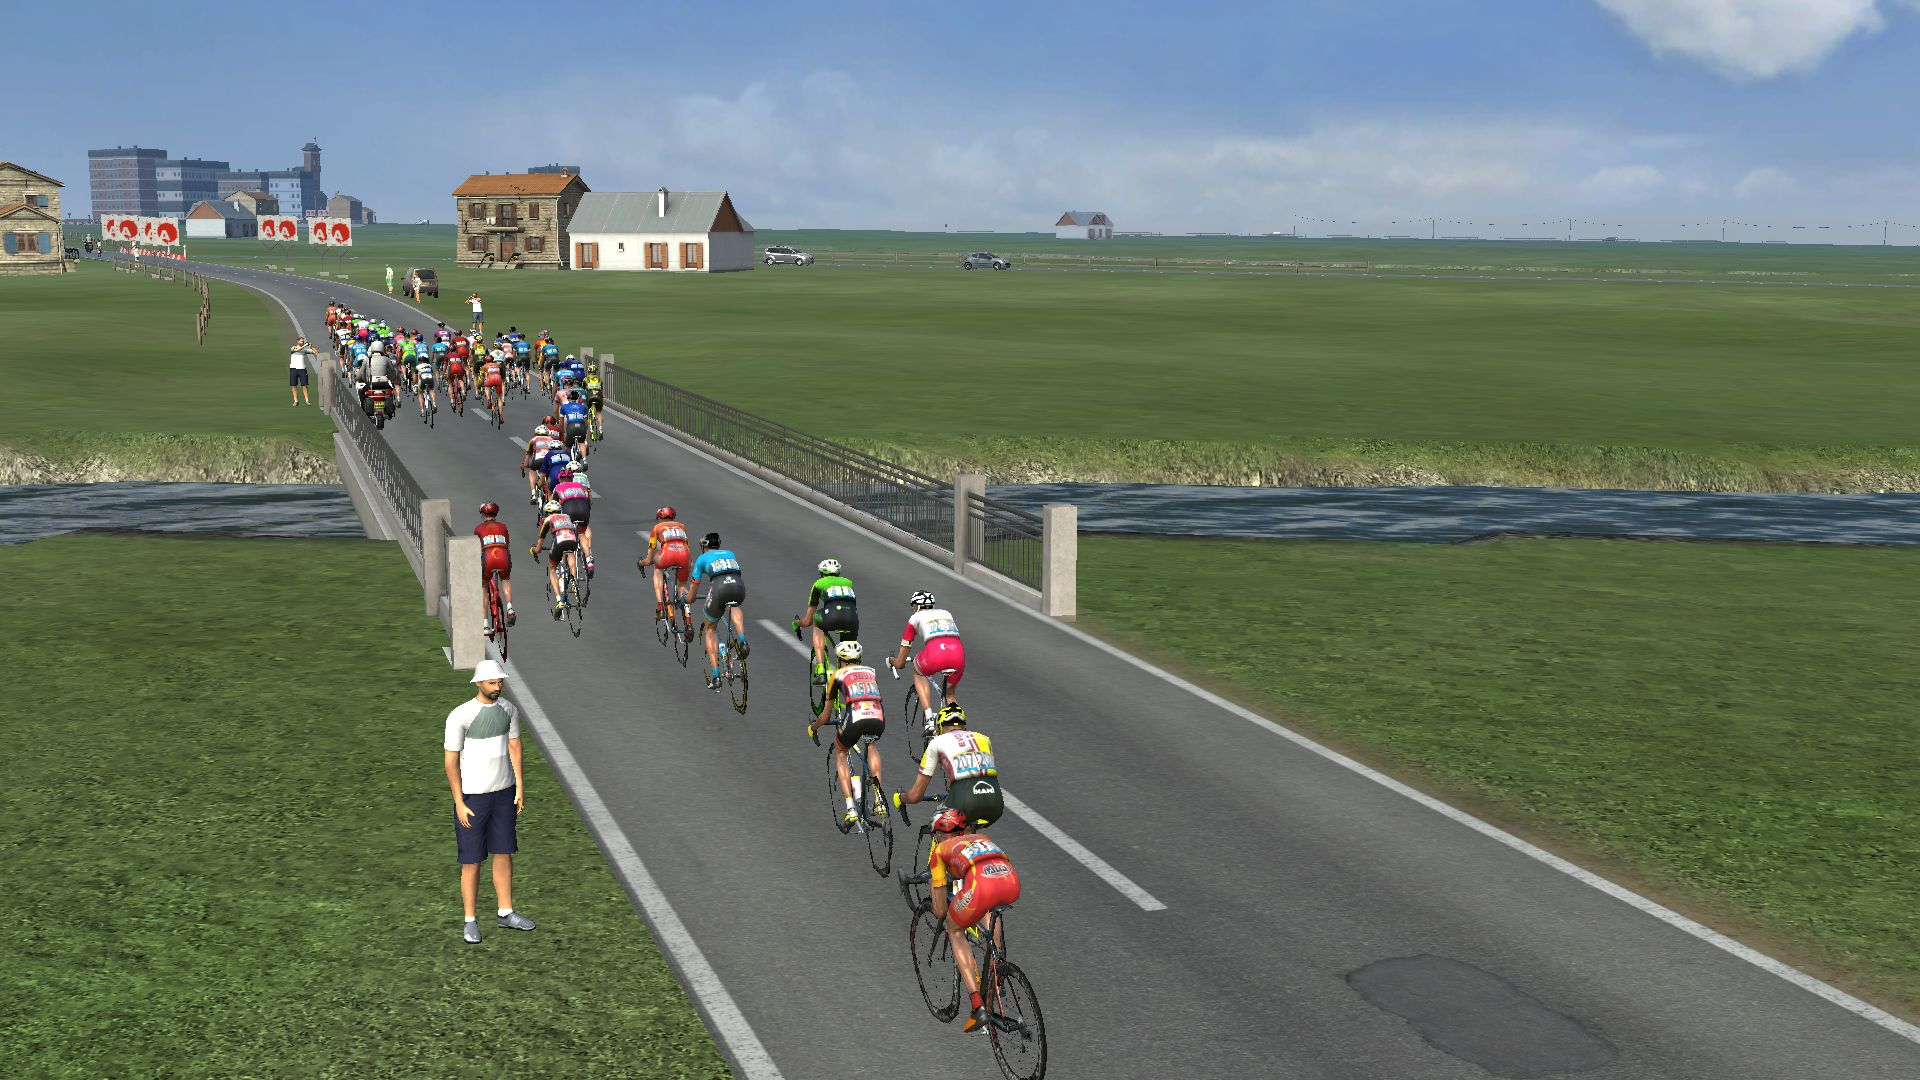 pcmdaily.com/images/mg/2019/Races/GTM/Giro/mg19_giro_12_PCM0121.jpg